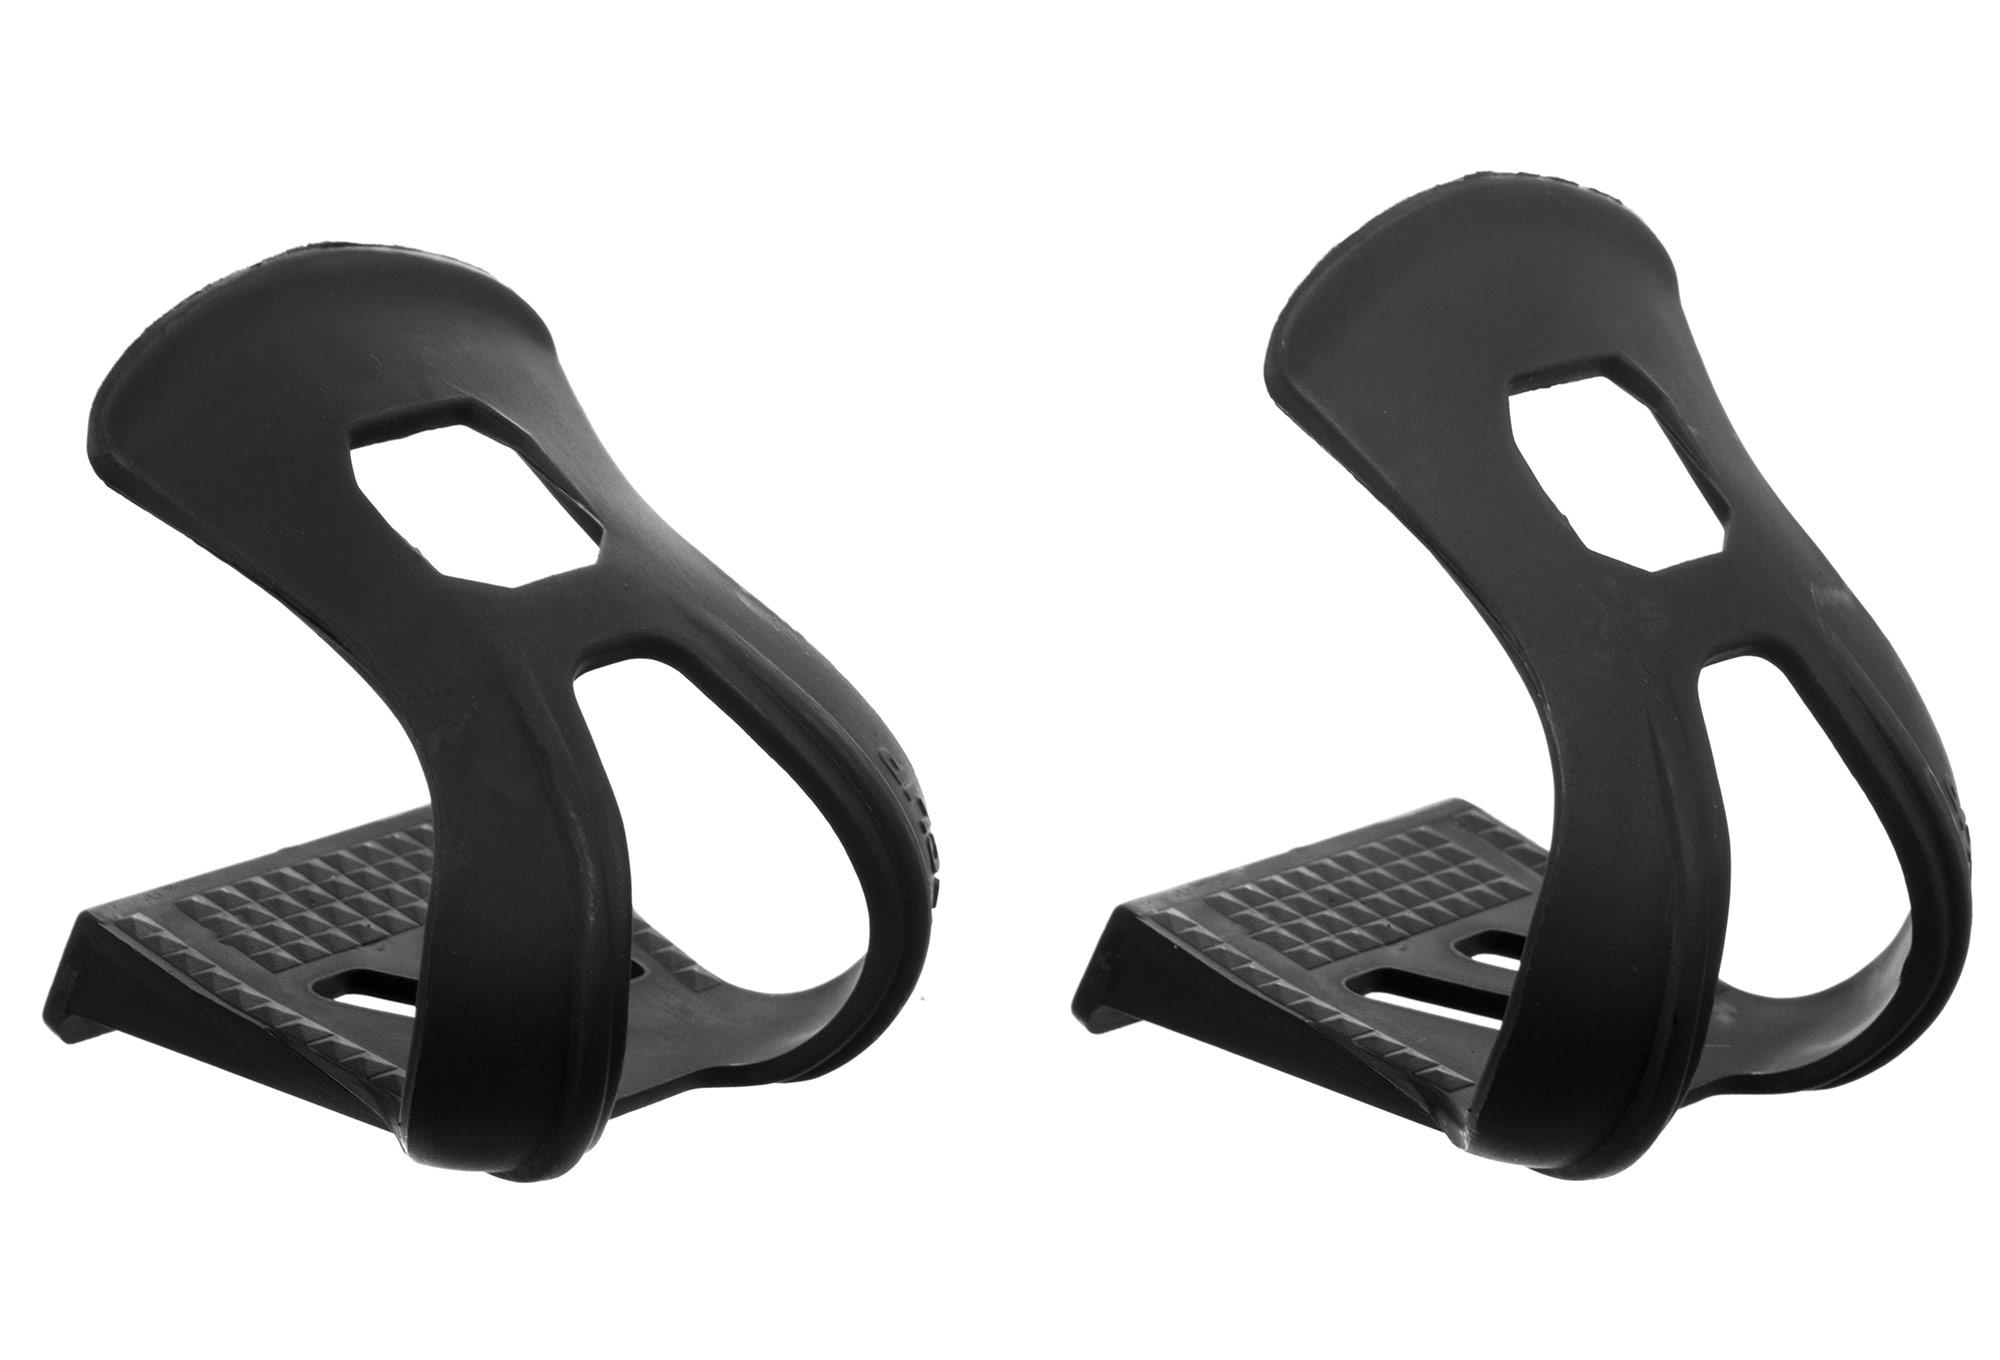 cale pied universel gpa. Black Bedroom Furniture Sets. Home Design Ideas